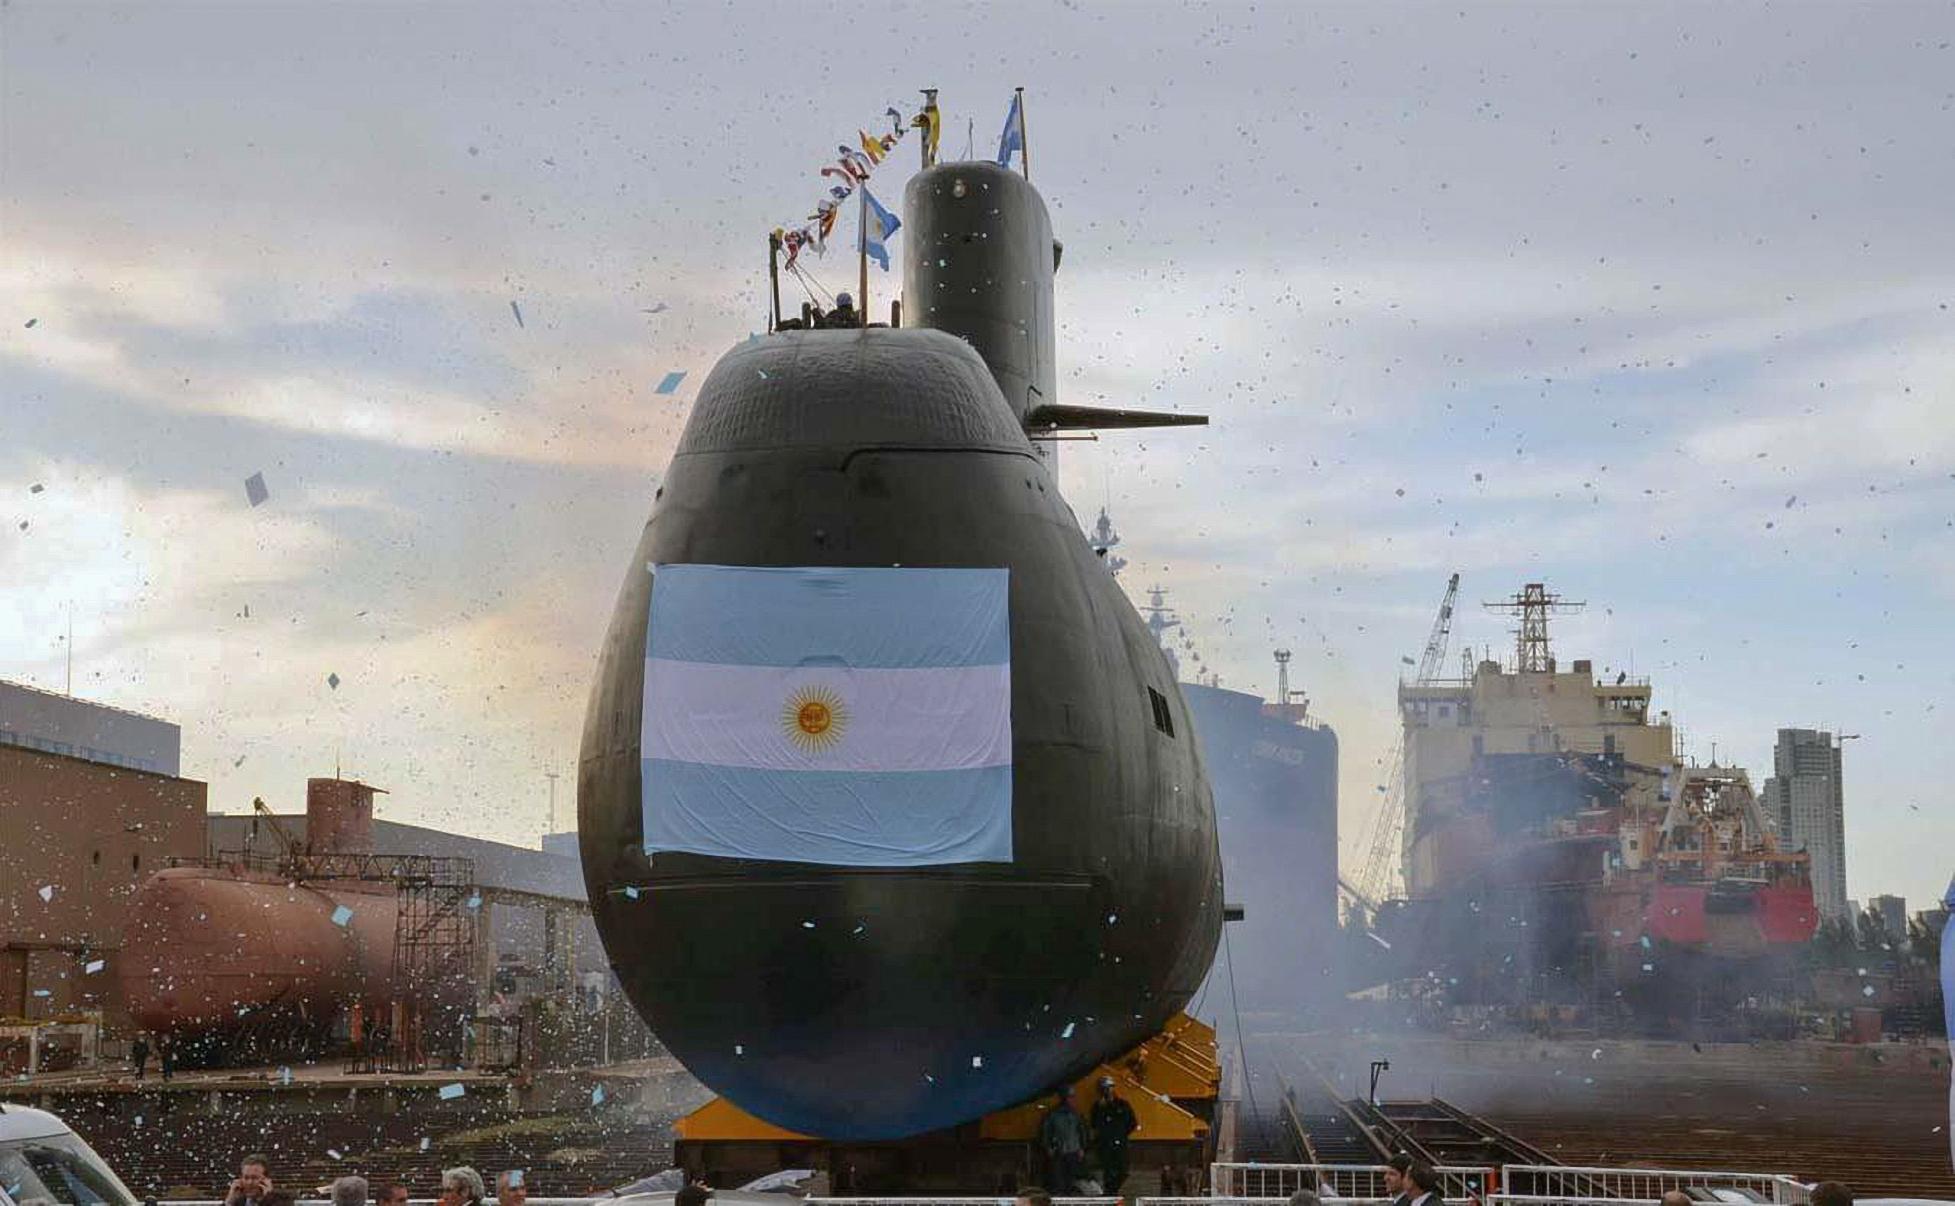 El submarino tiene 44 tripulantes a bordo (Télam)